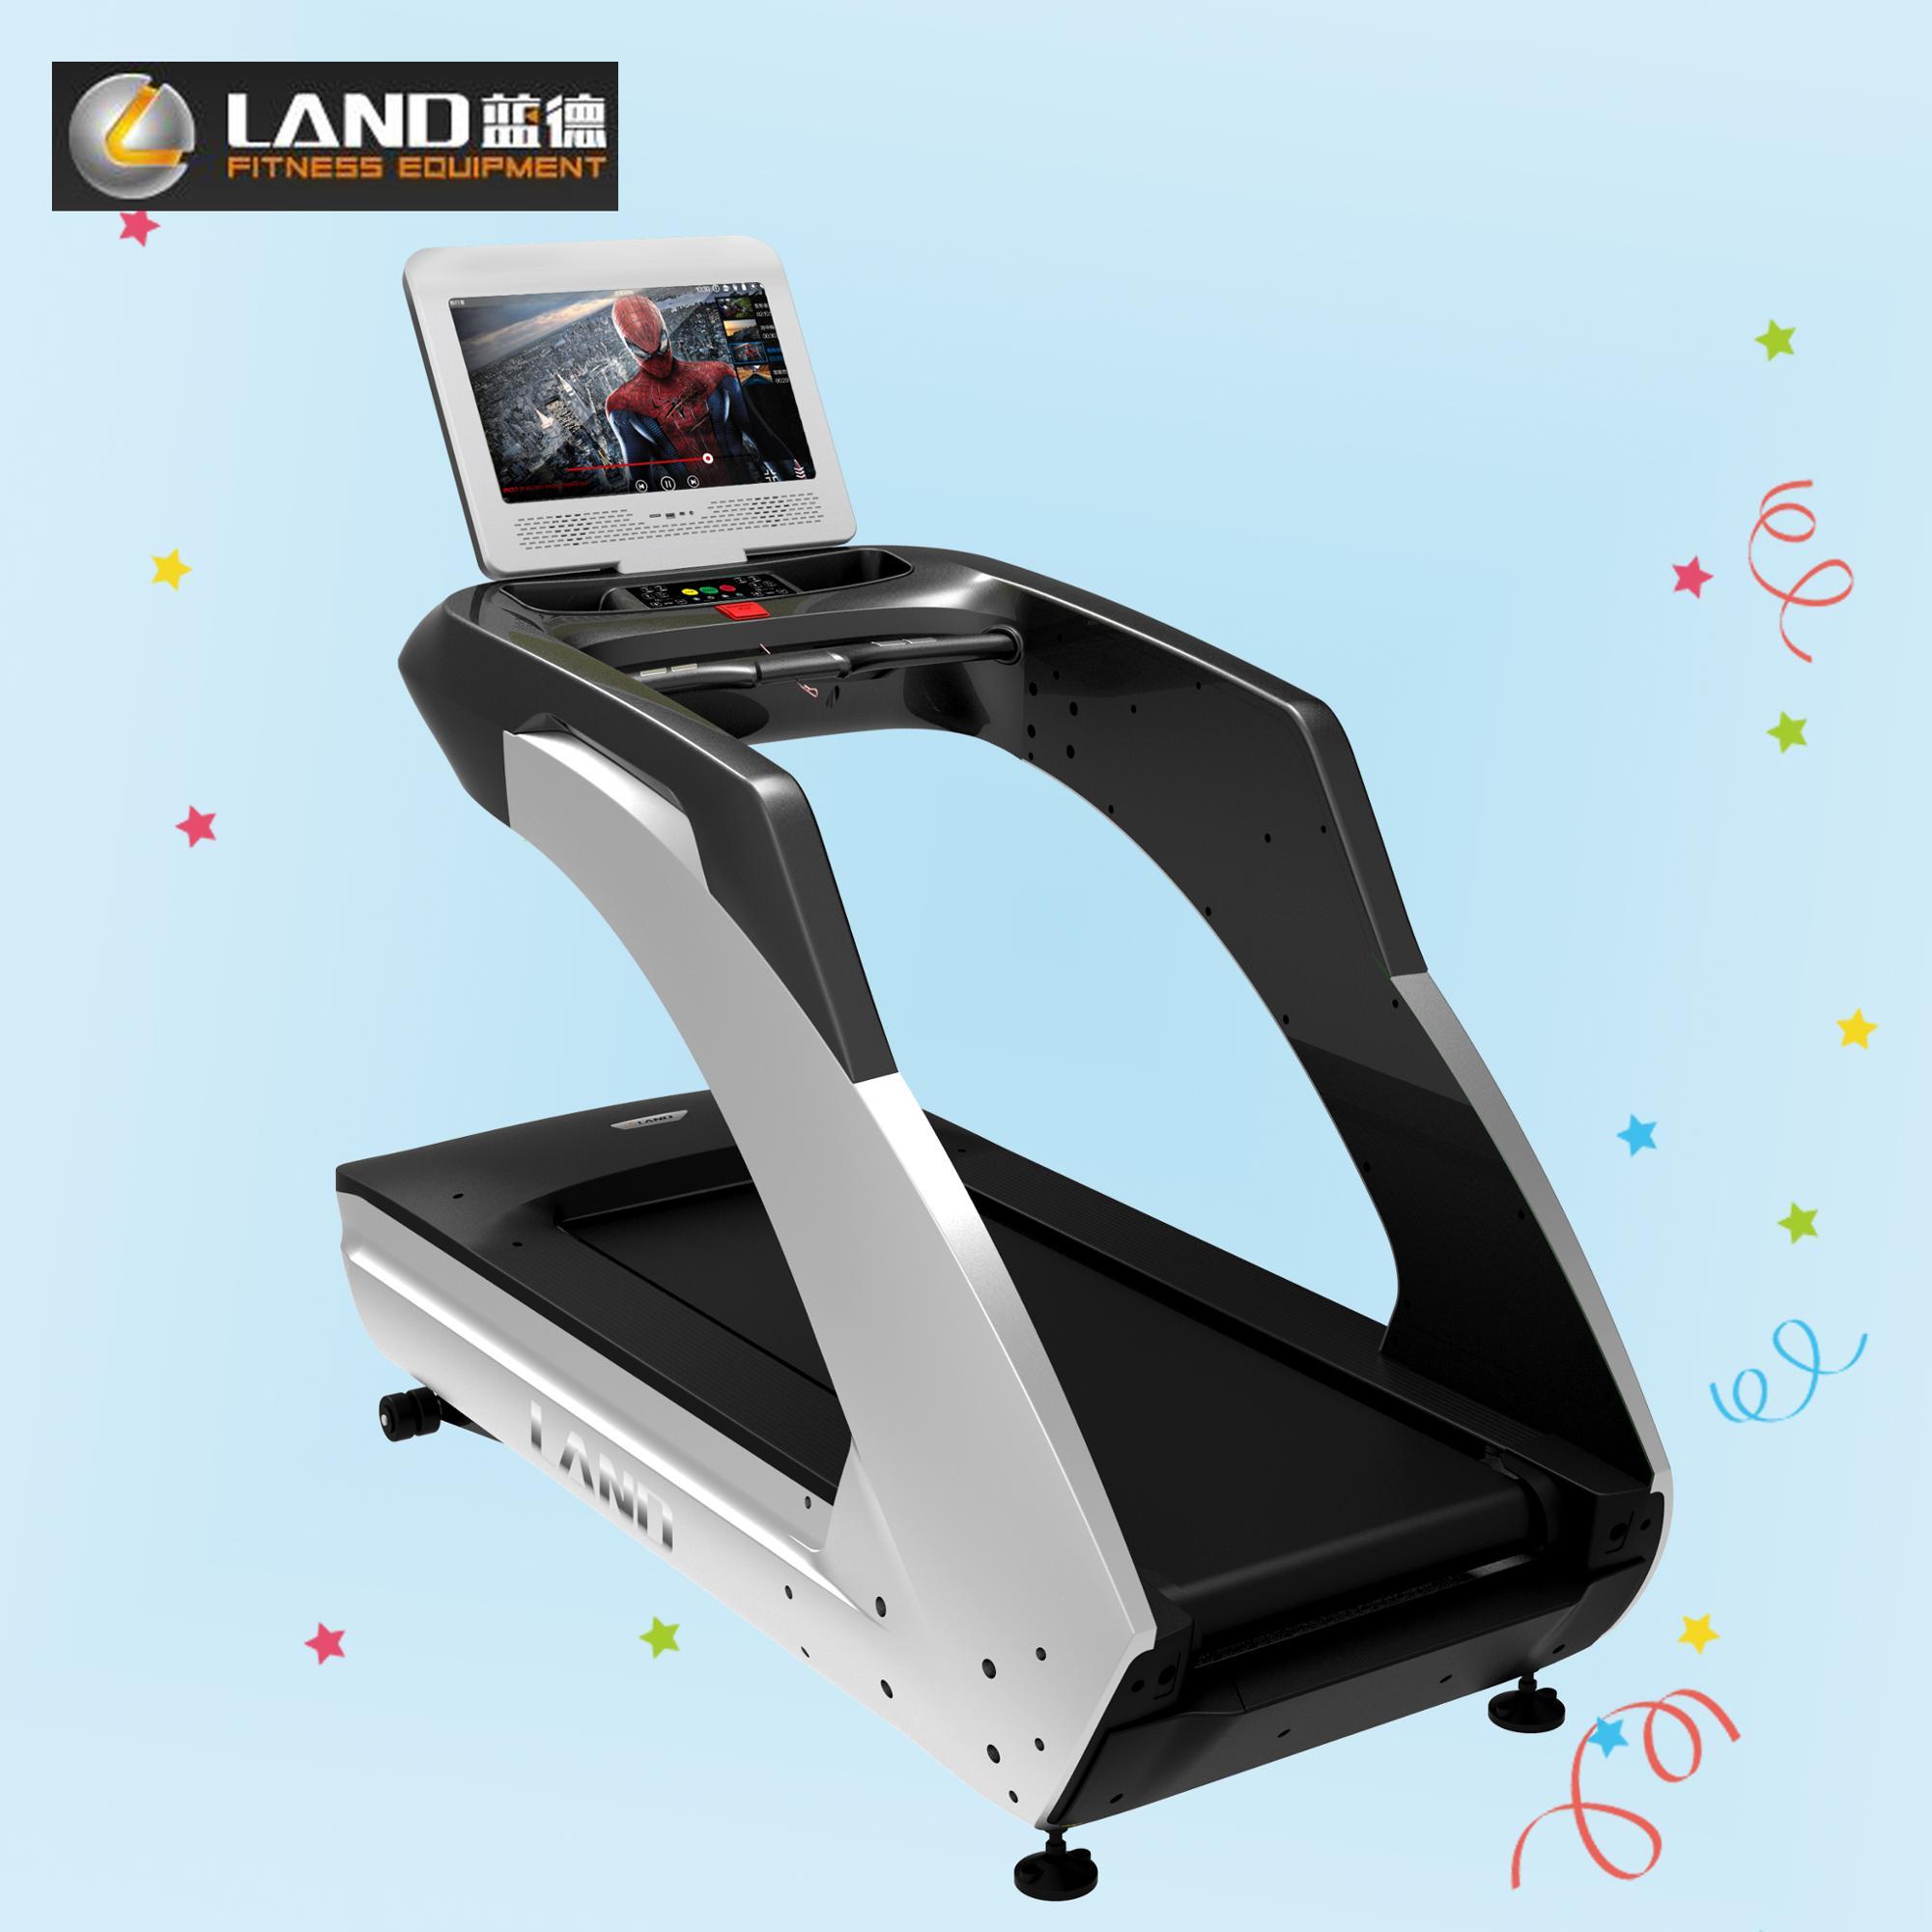 3HP Treadmill LAND FITNESS Cardio Equipment LCD Screen Treadmill